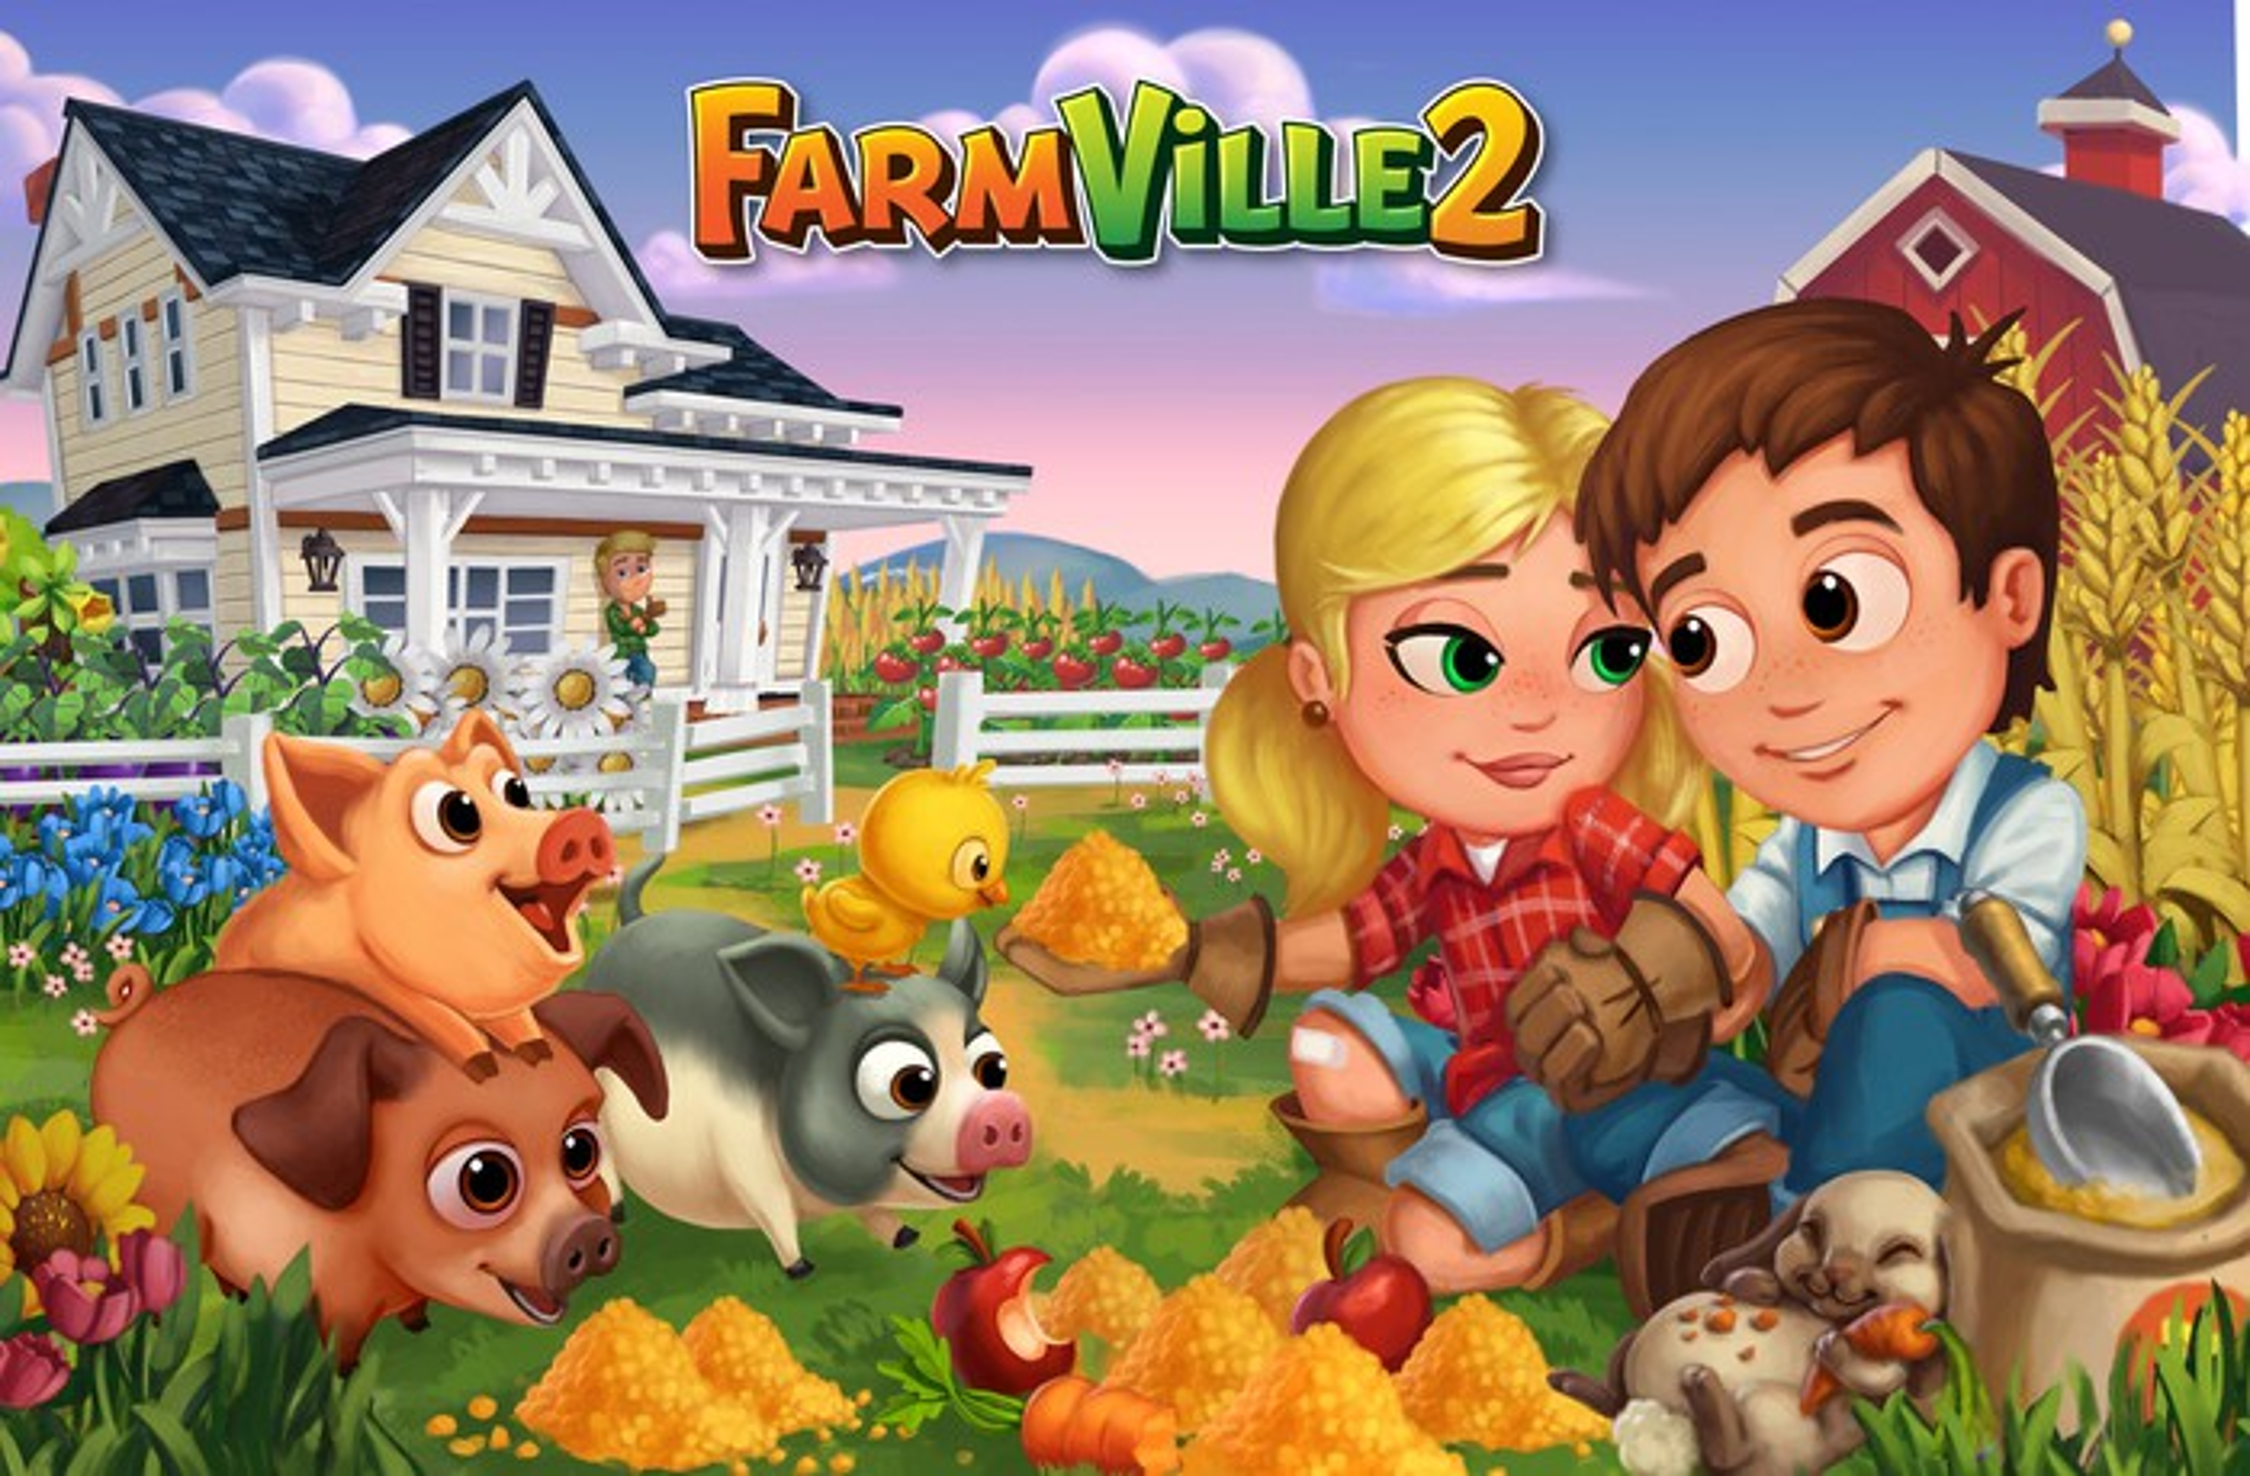 Farmville 2 banner.